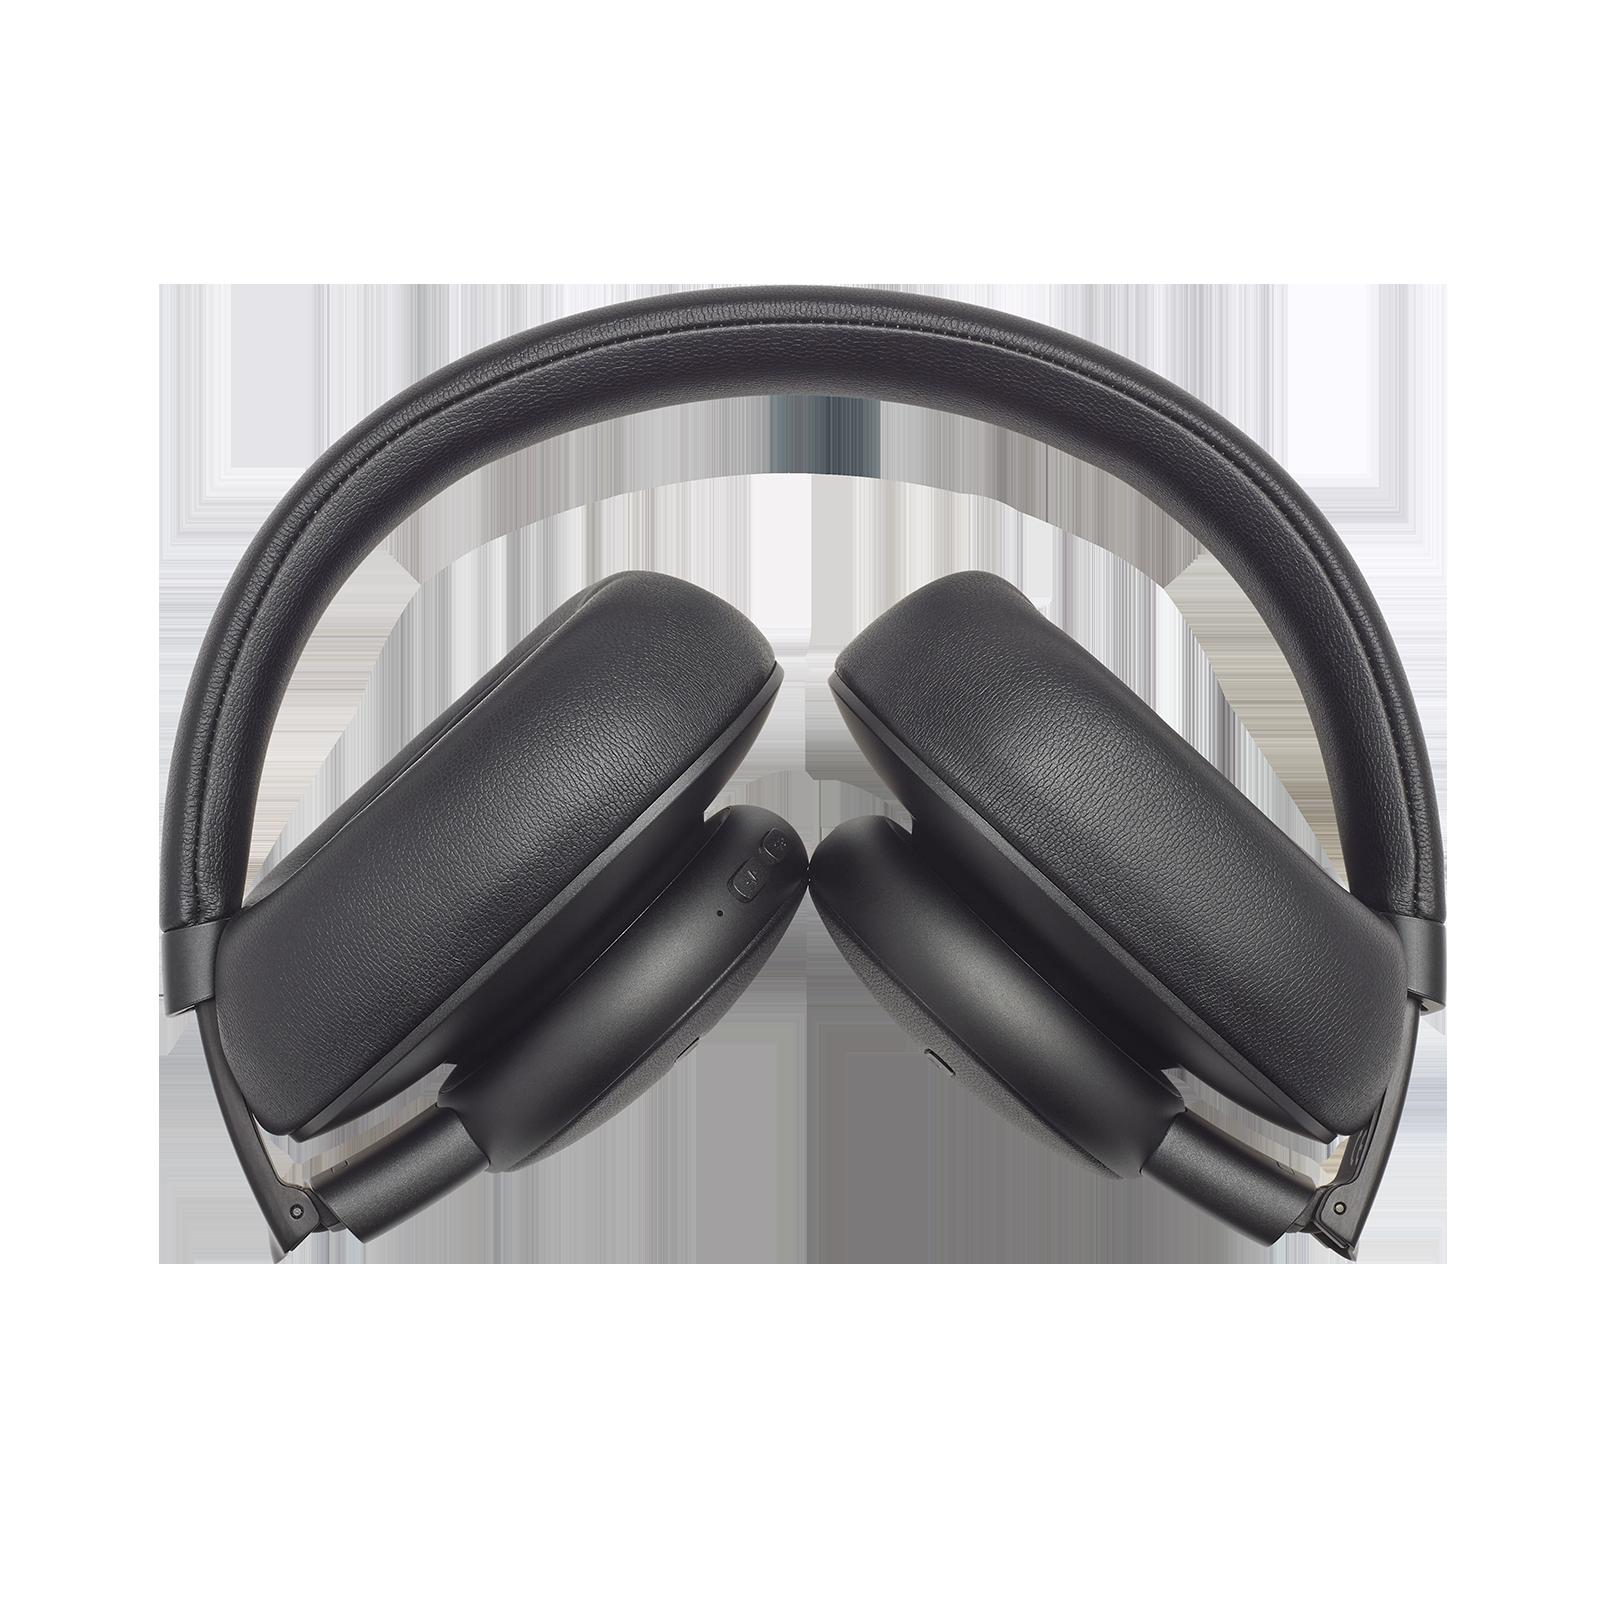 Harman Kardon FLY ANC - Black - Wireless Over-Ear NC Headphones - Detailshot 7